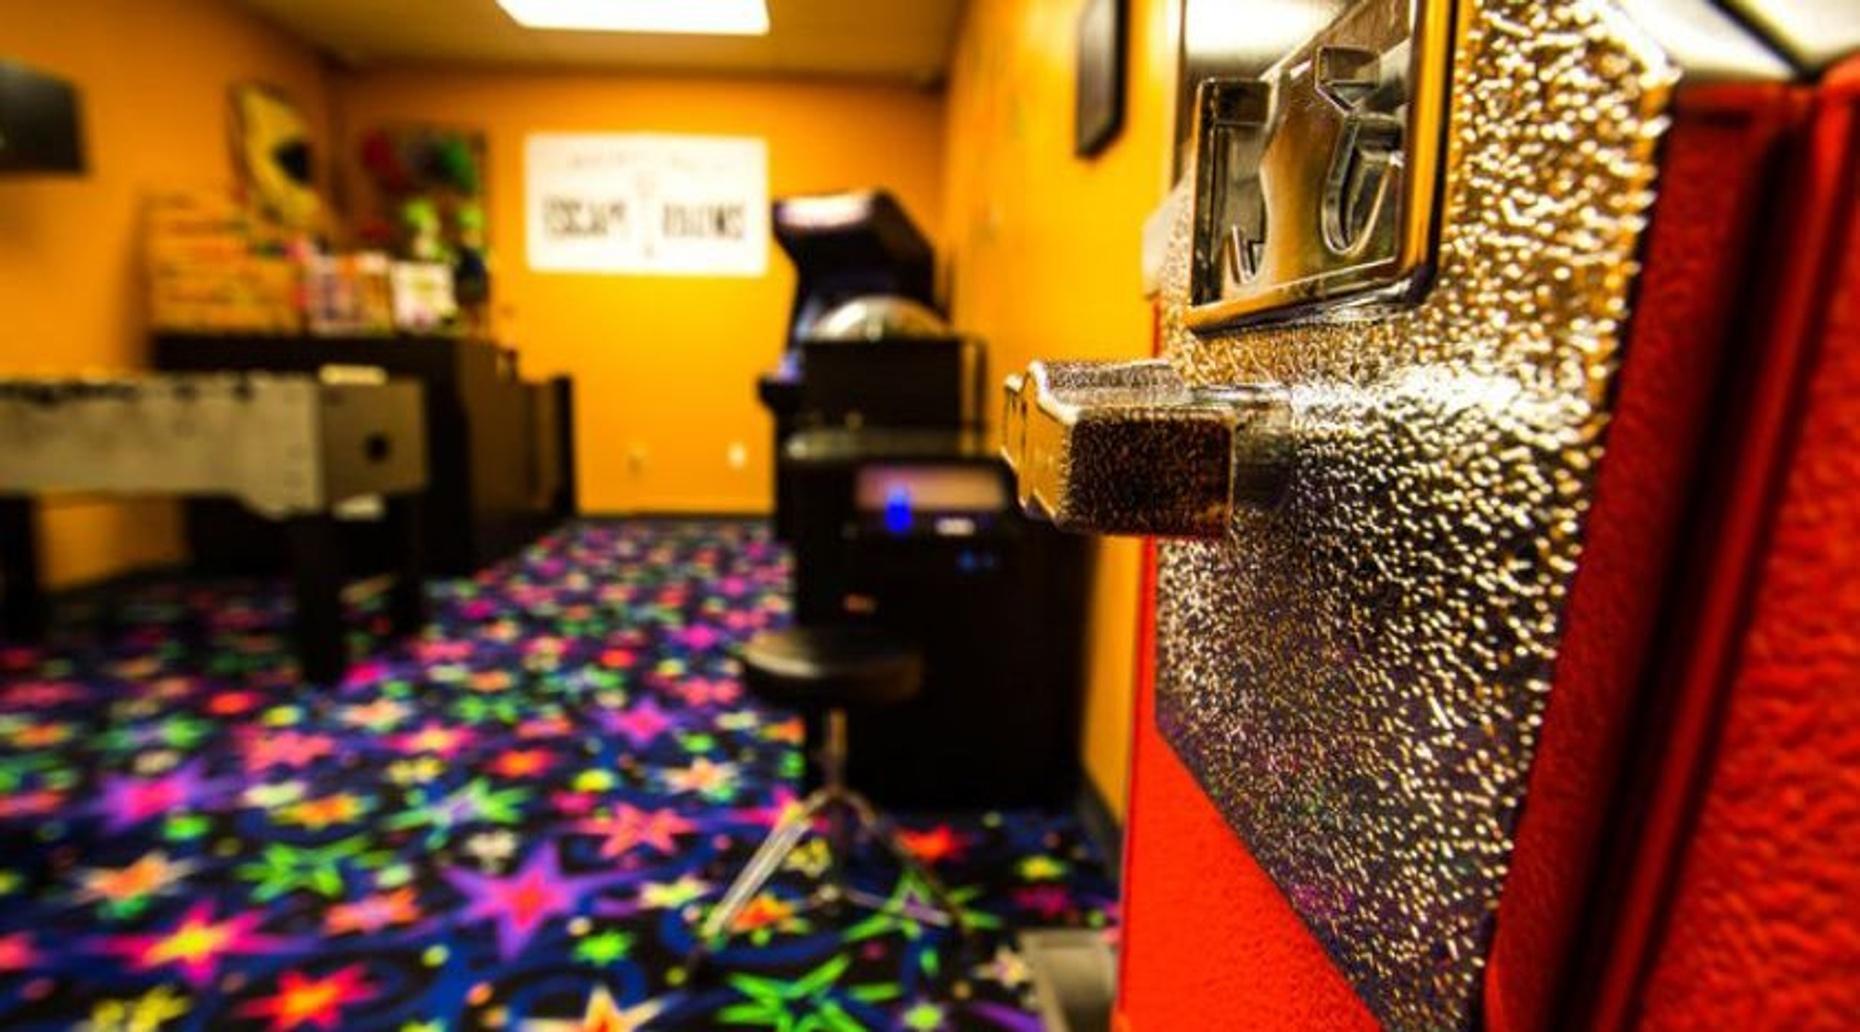 Arcade Escape Game Challenge in Beaverton